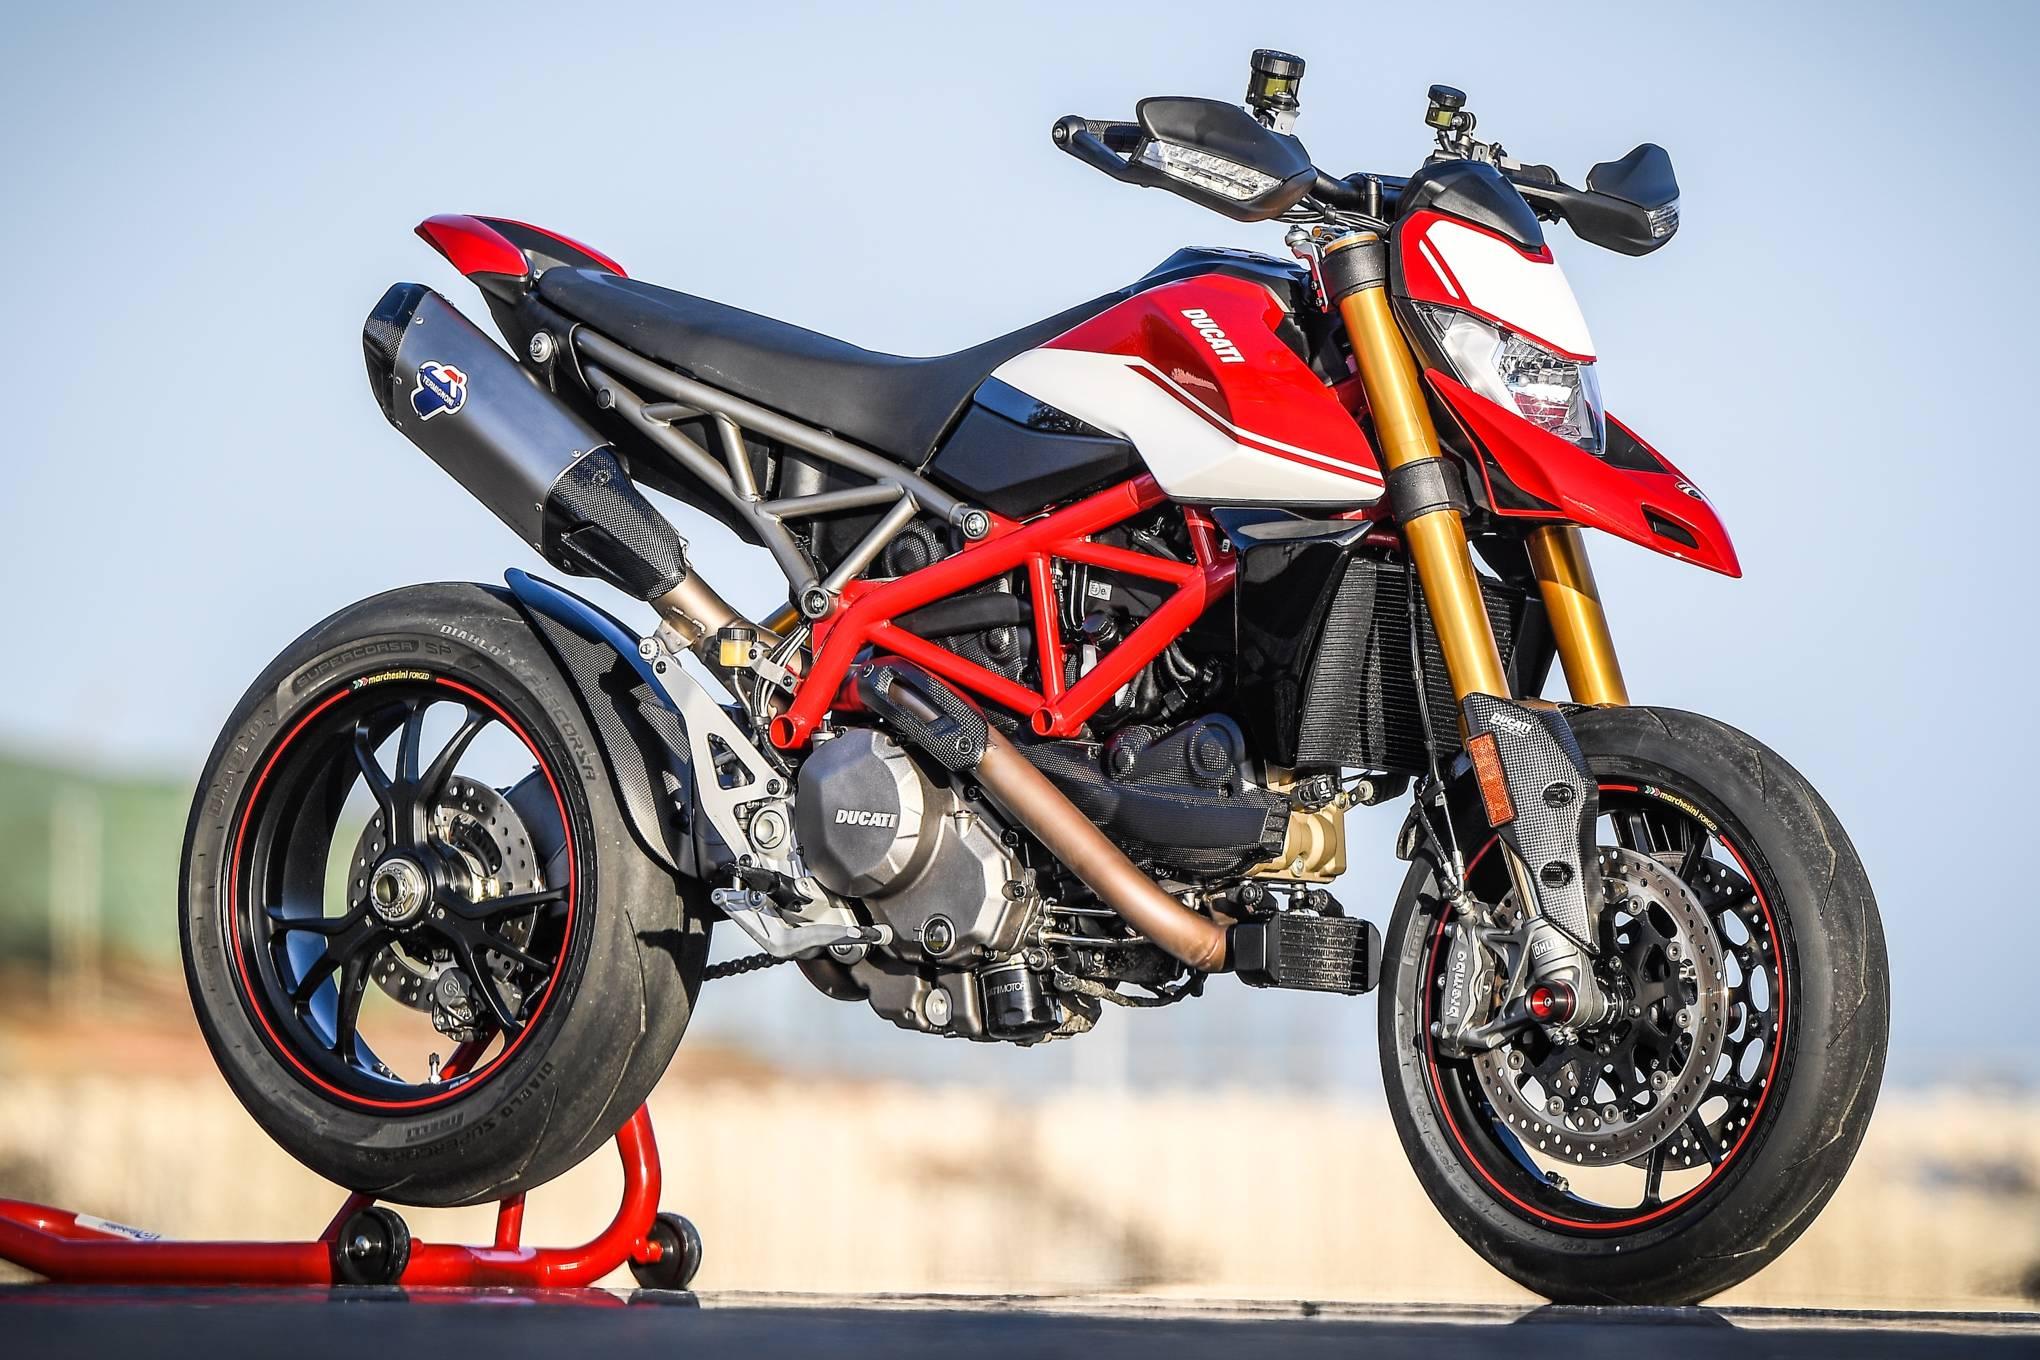 Ducati Hypermotard 950 Review British Gq